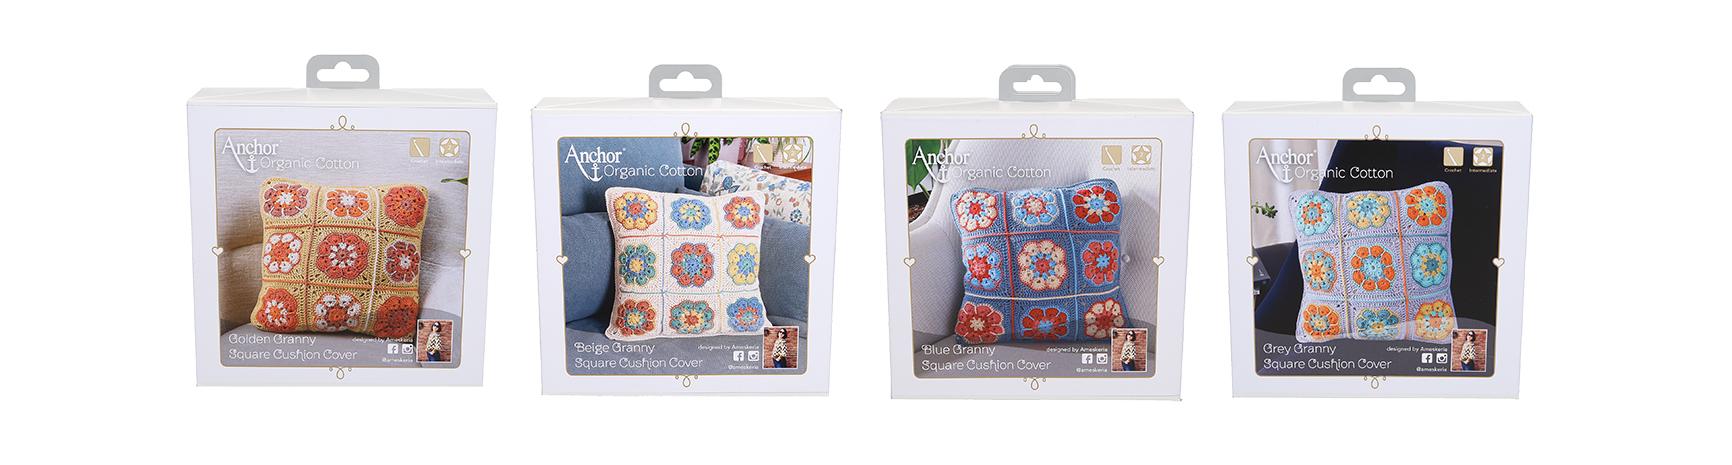 Anchor Organic Cotton Kits